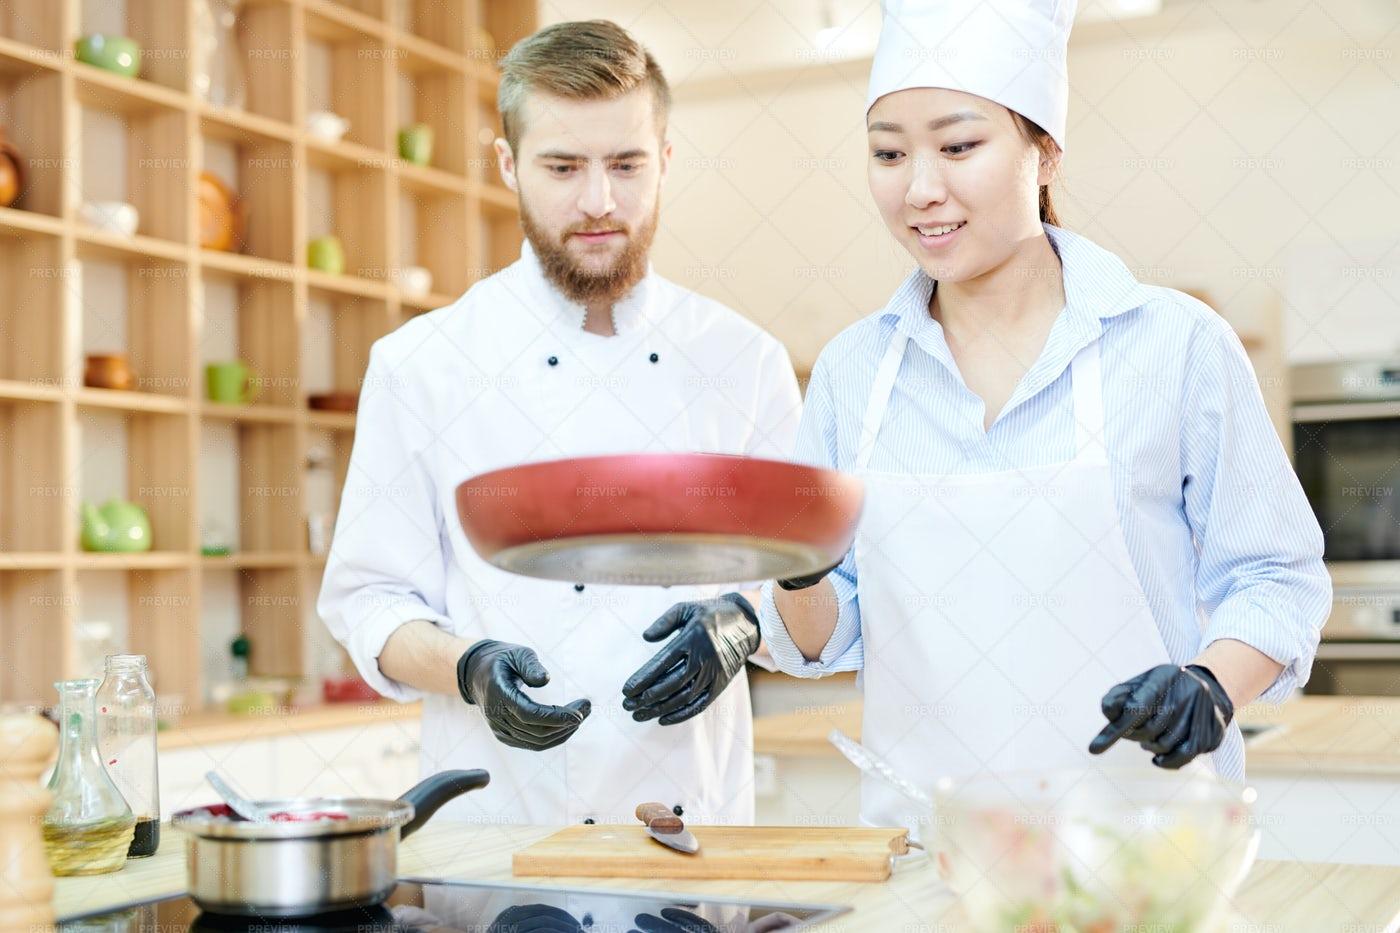 Cheerful Chefs Working In Kitchen: Stock Photos